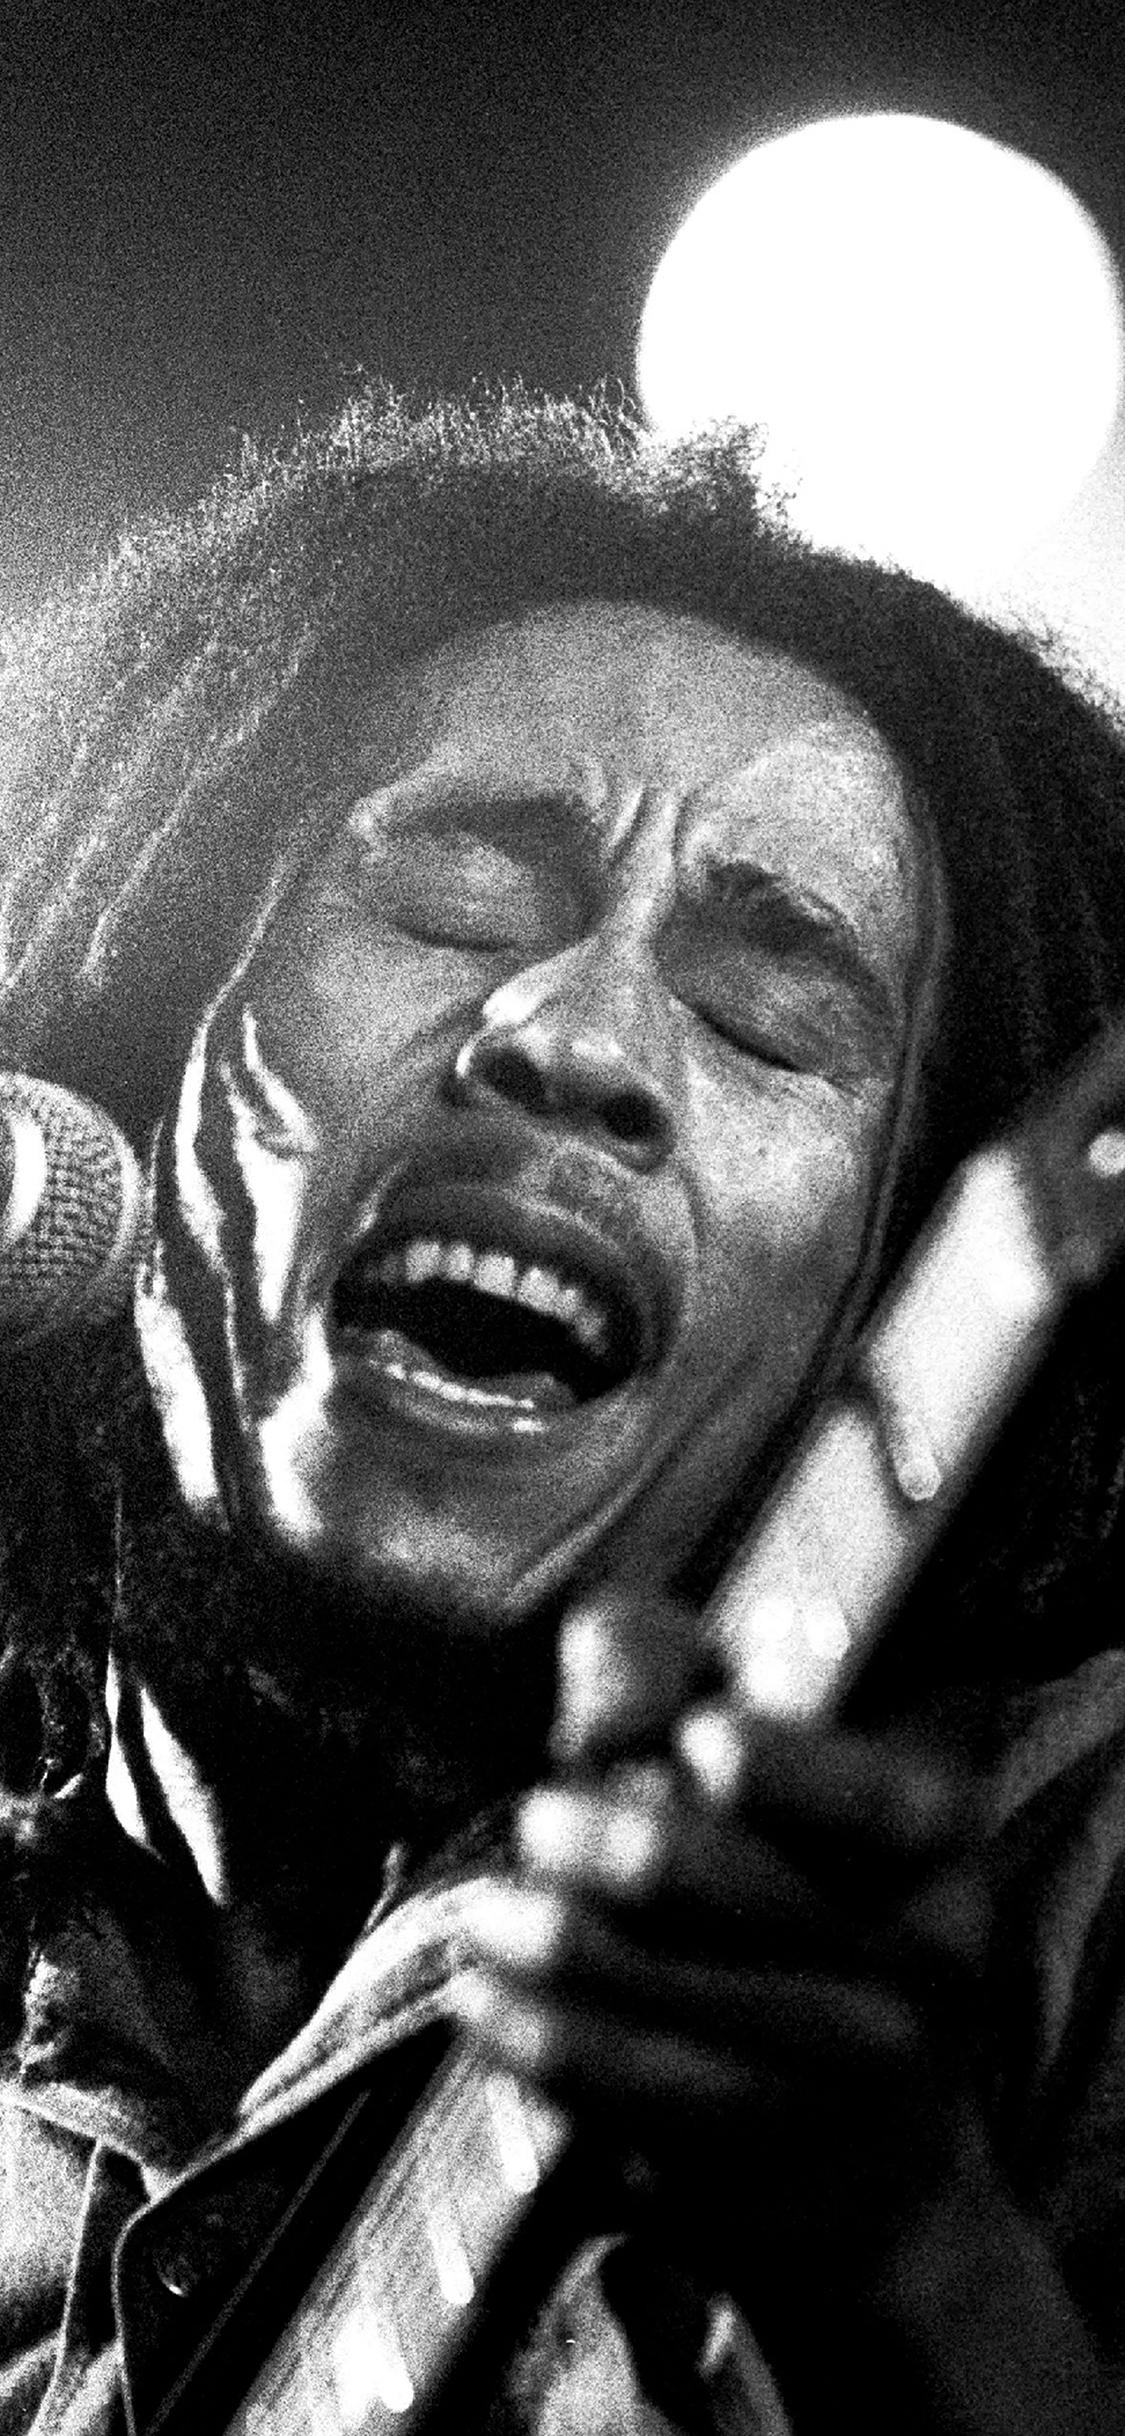 iphonexpapers - he16-bob-marley-dark-art-illust-music-reggae-celebrity